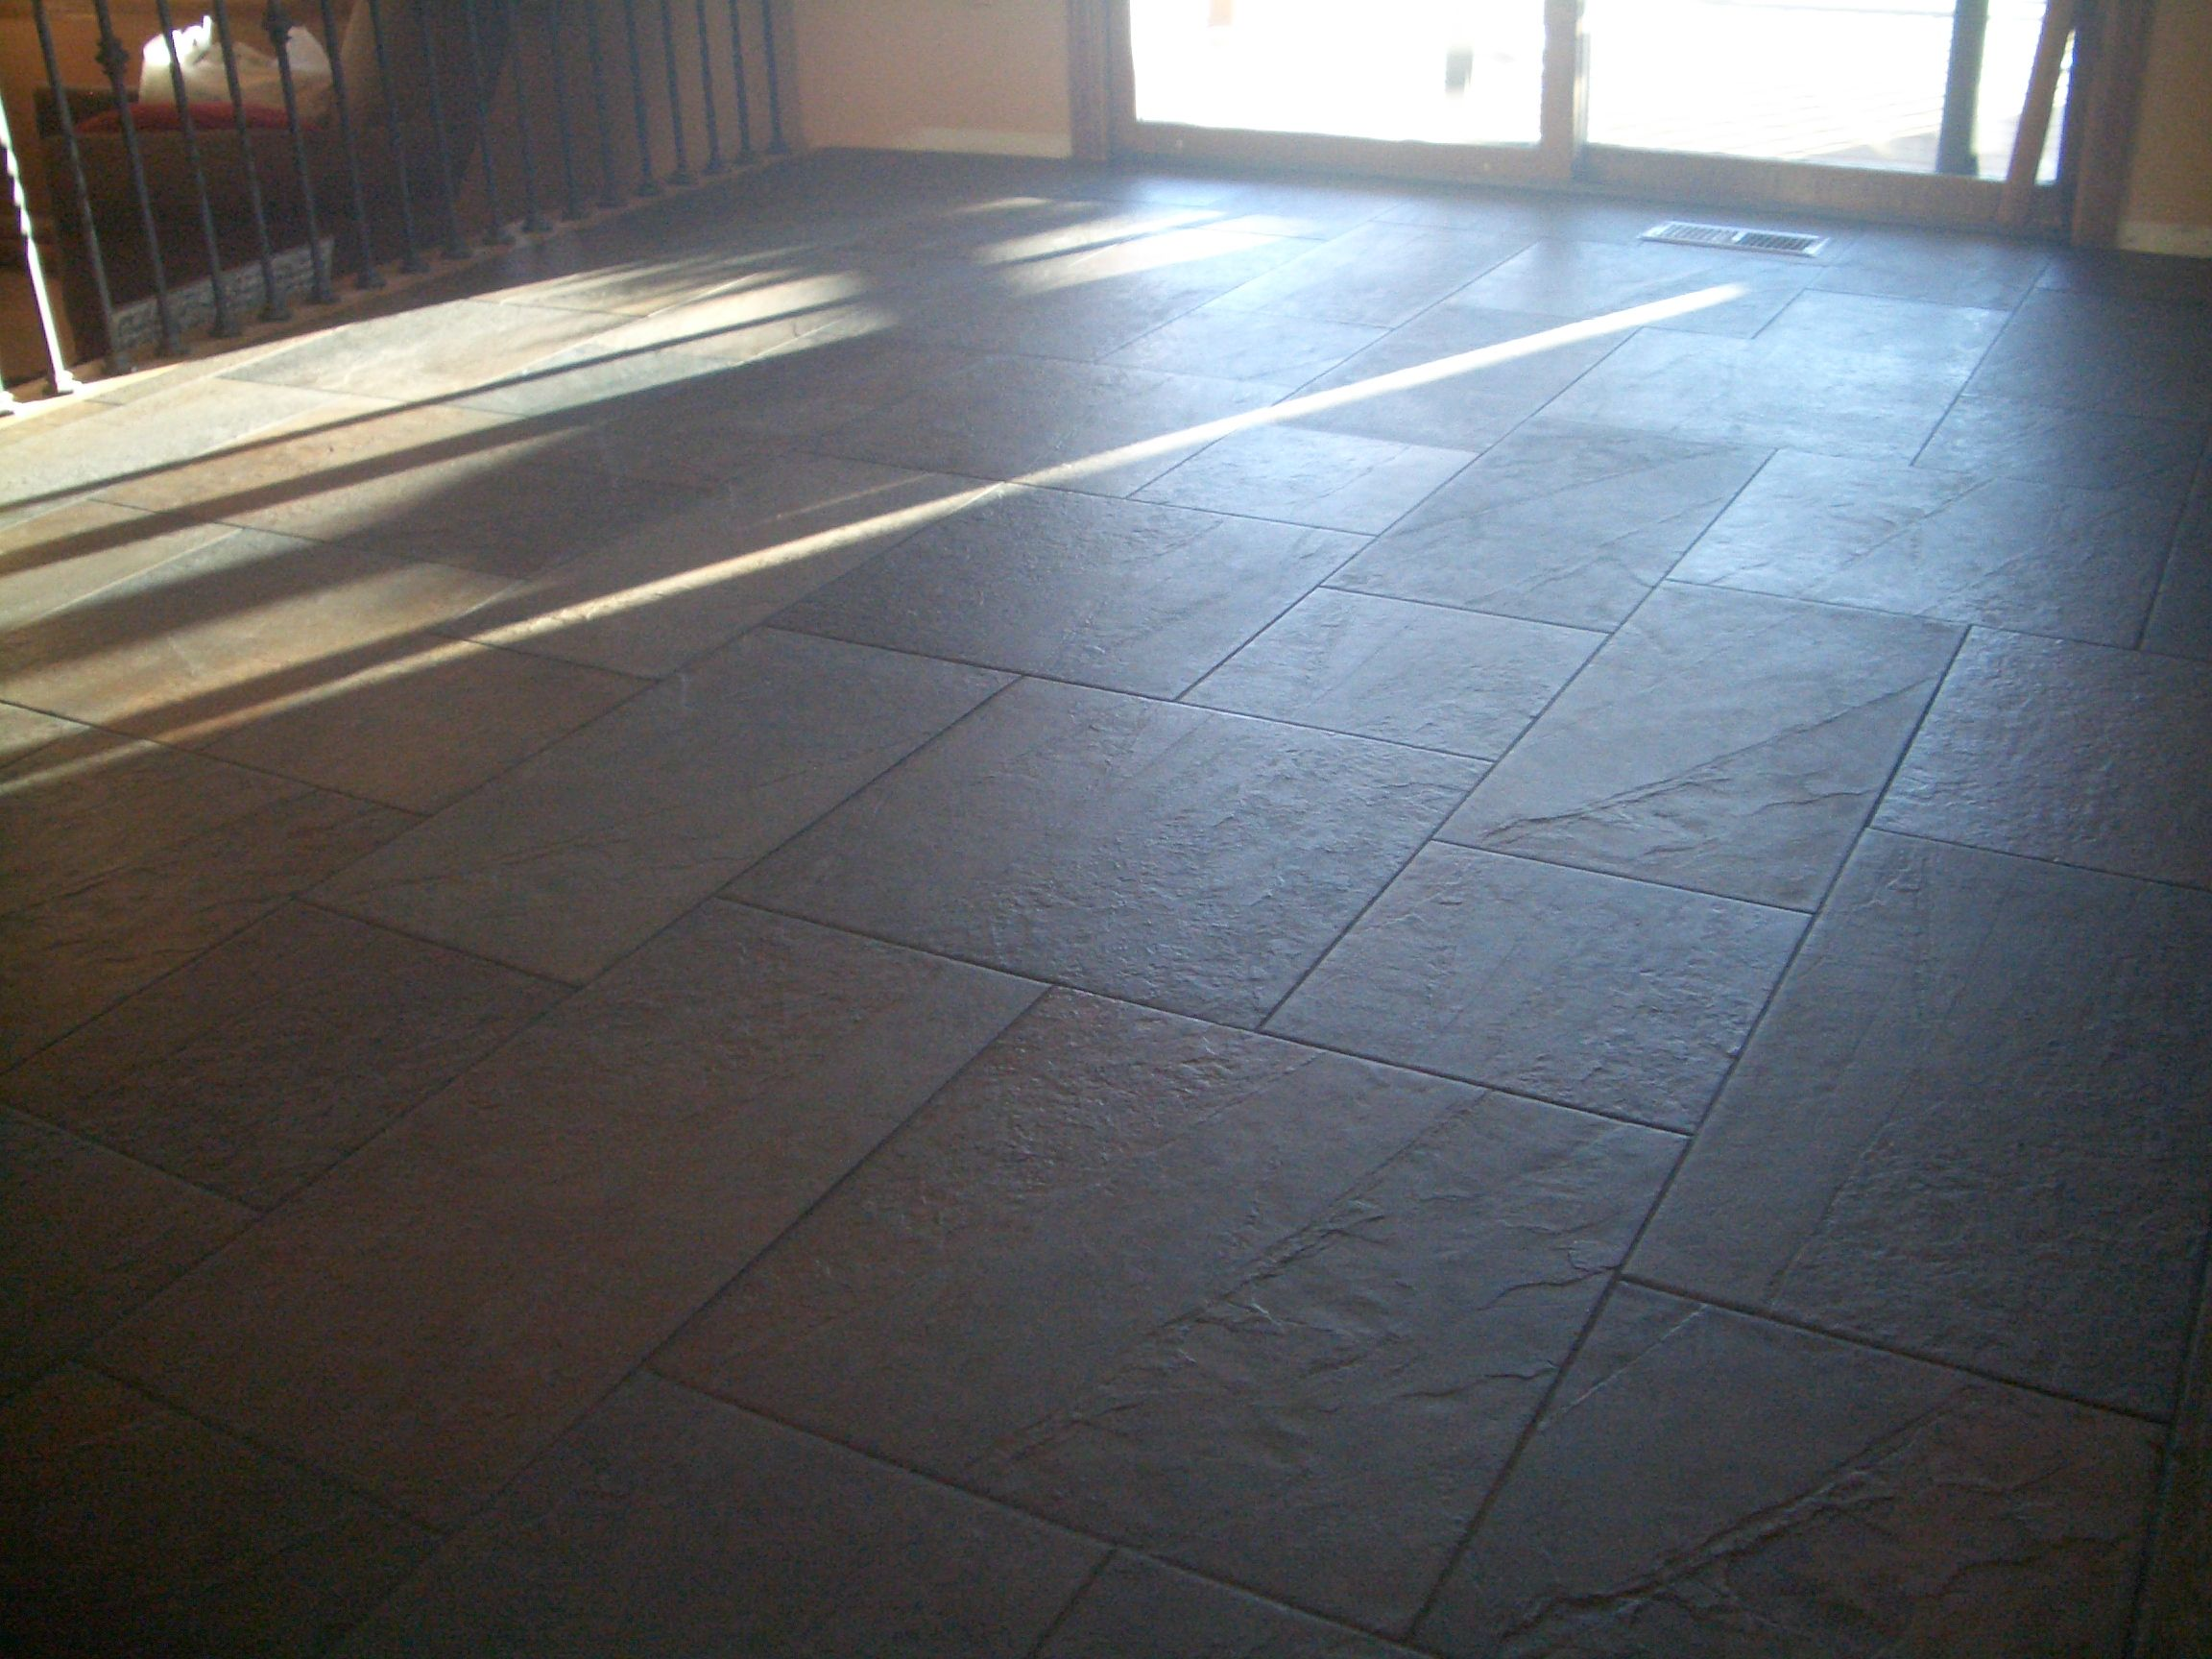 Slate look tile flooring gallery home flooring design slate look tile flooring twobiwriters porcelain slate look tile that looks like marialoaizafo gallery doublecrazyfo Images